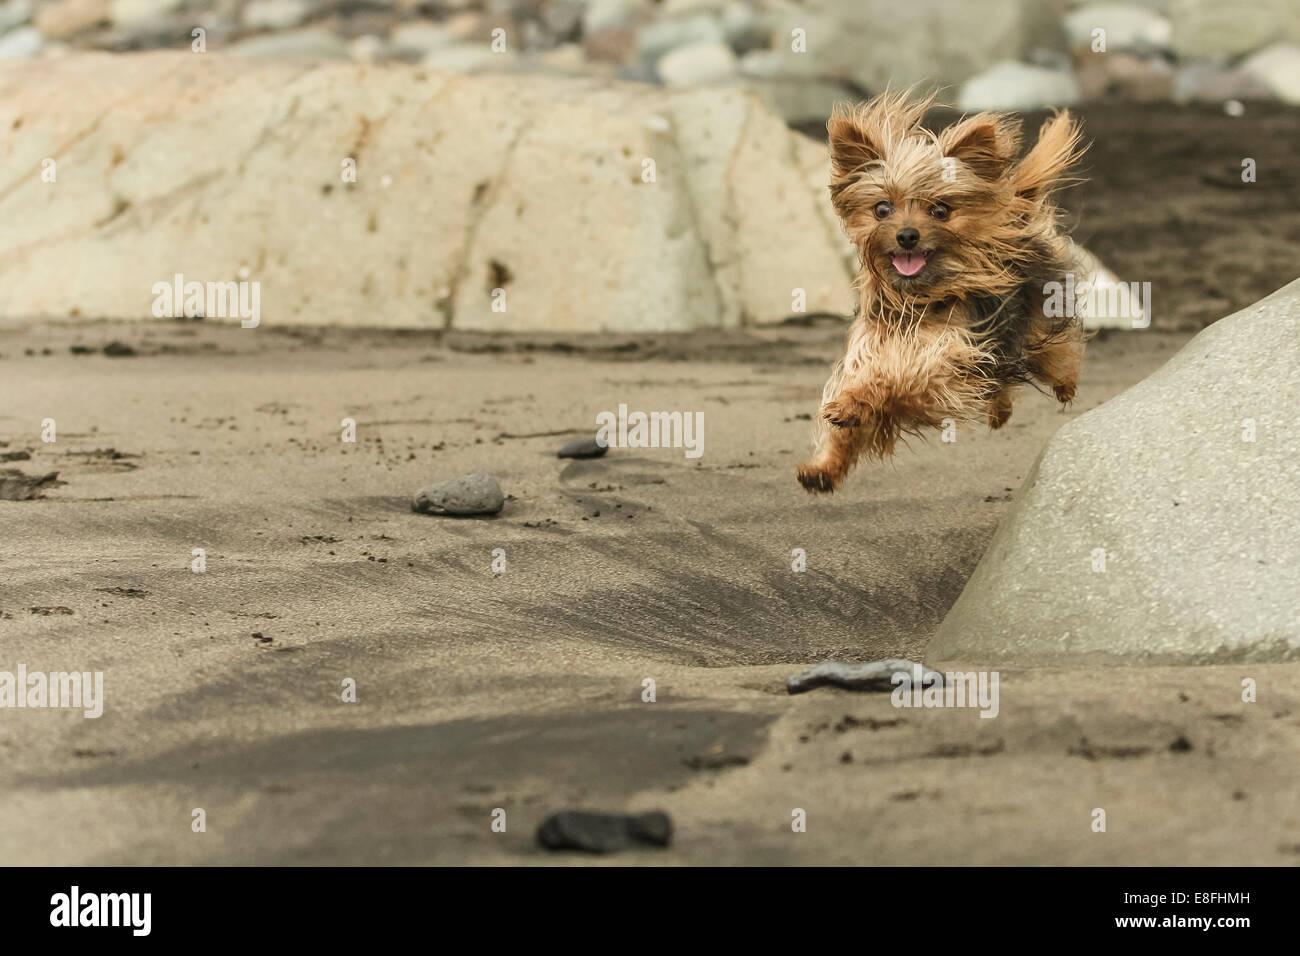 Yorkshire Terrier running on beach - Stock Image